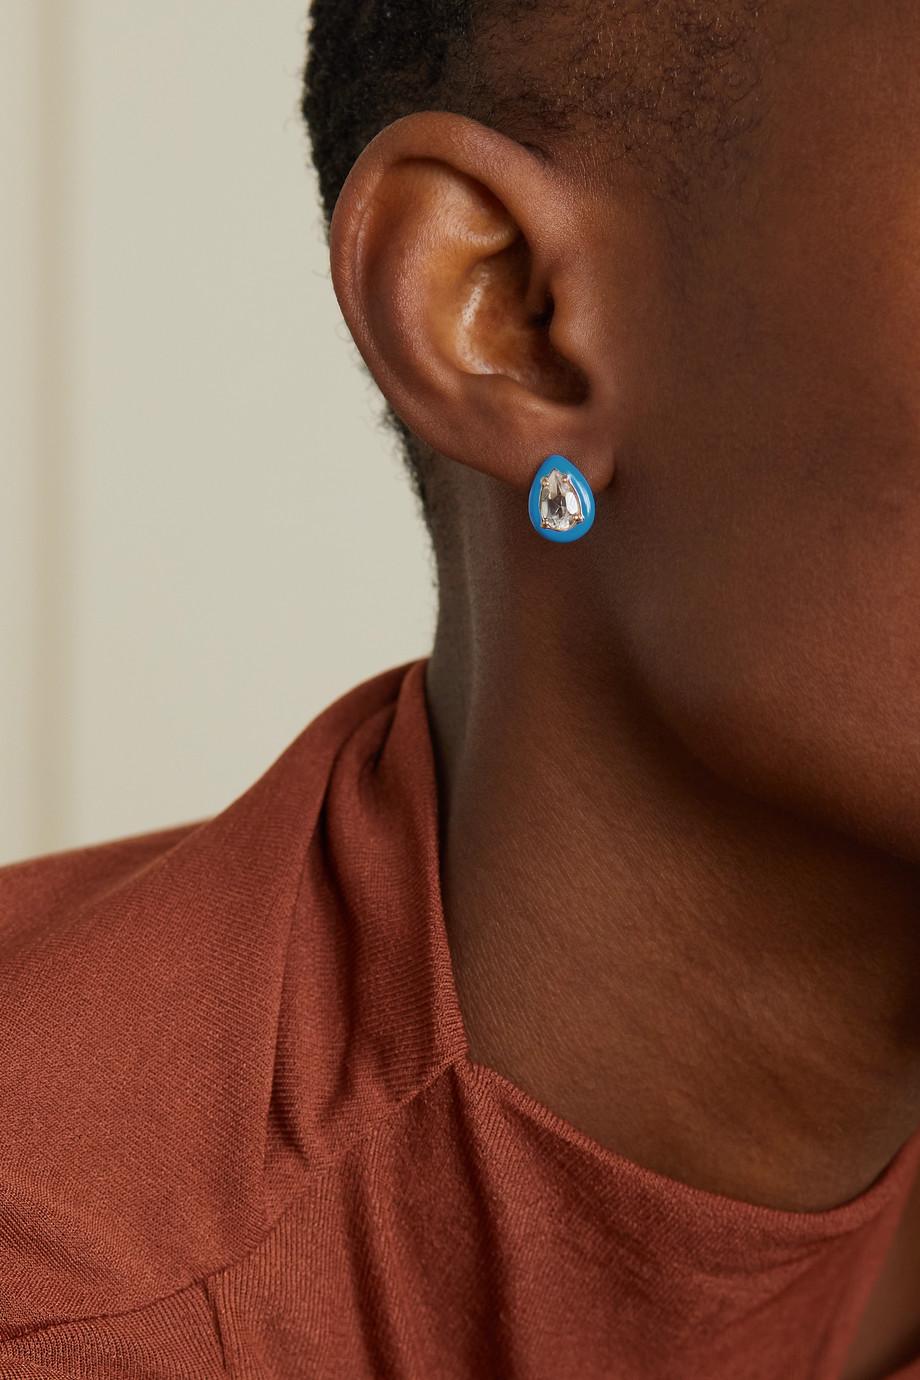 Bea Bongiasca Gum Drop gold, enamel and rock crystal earring